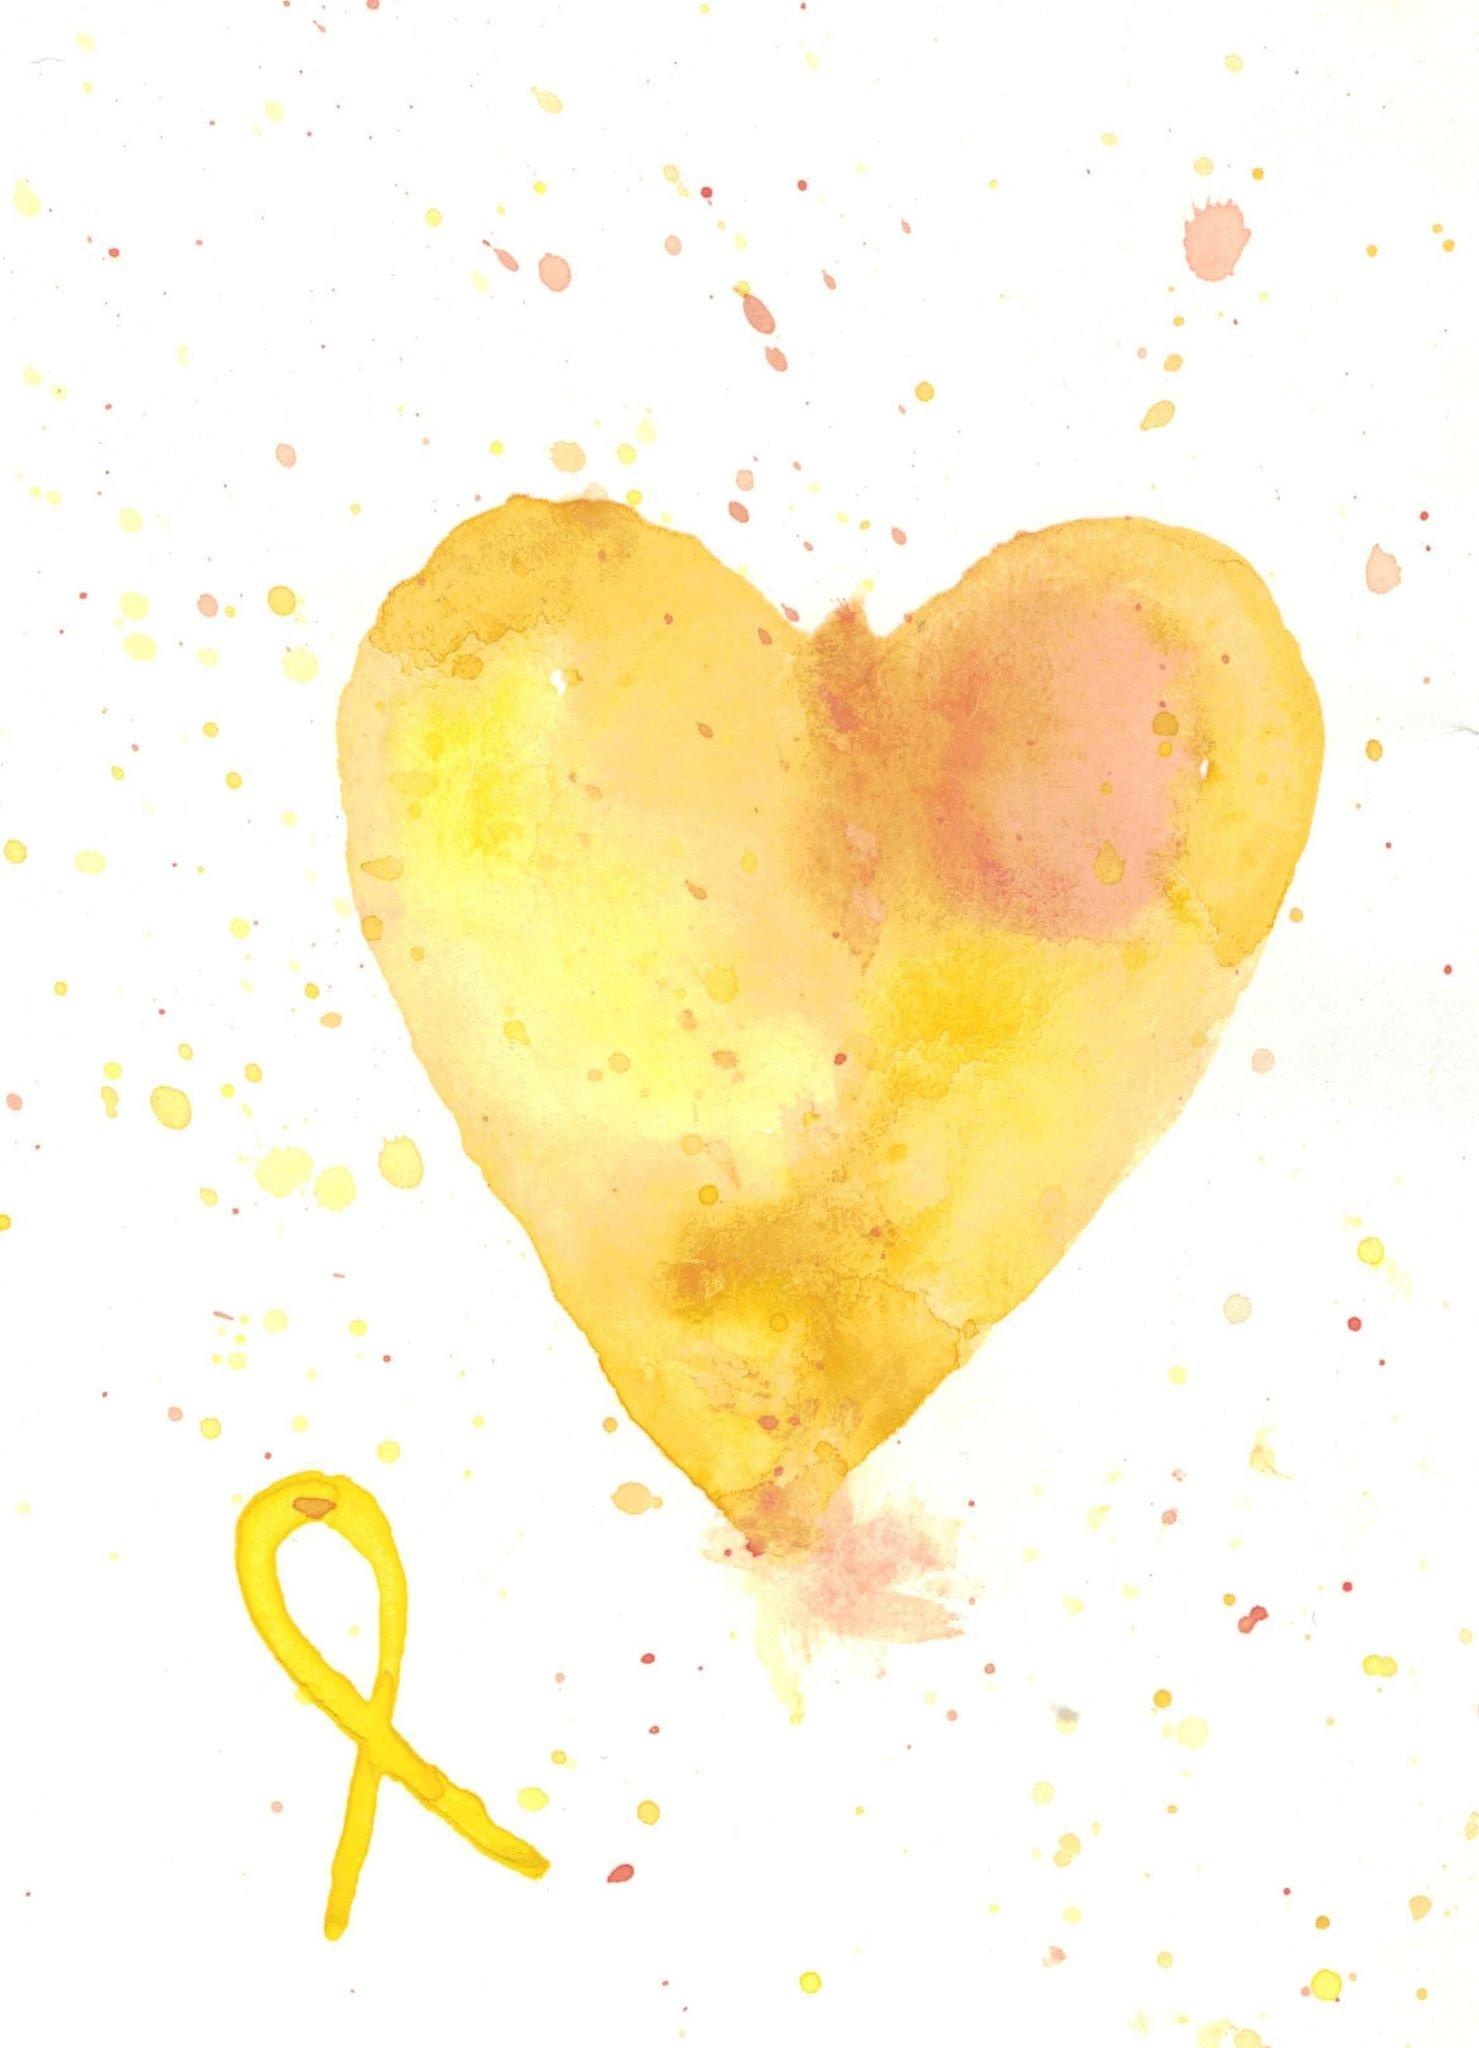 Endometrioosi teemaviikko